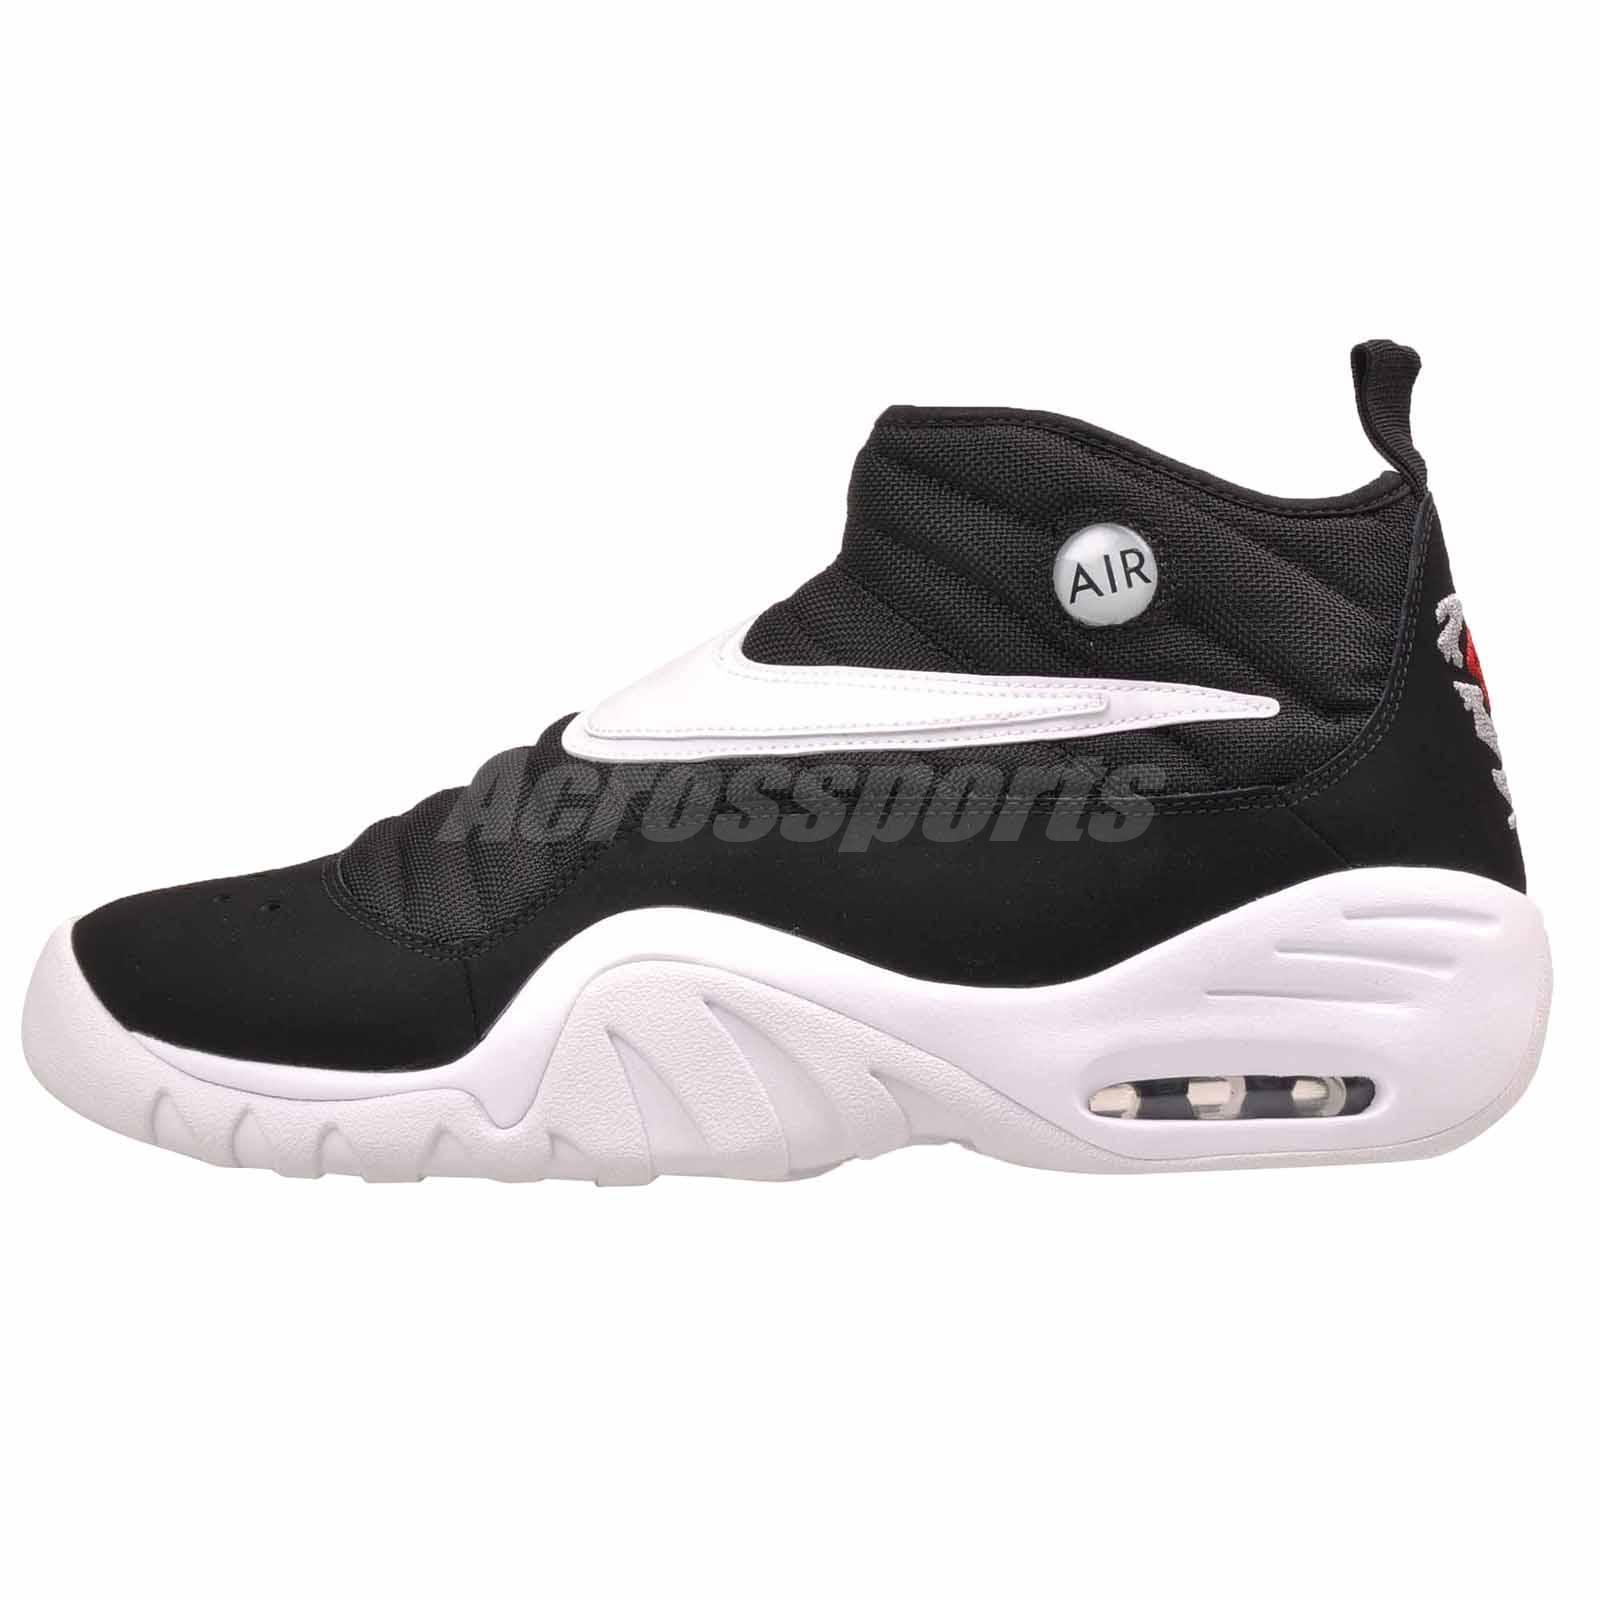 Nike Air Shake Ndestrukt Basketball Mens shoes Black White 880869-002